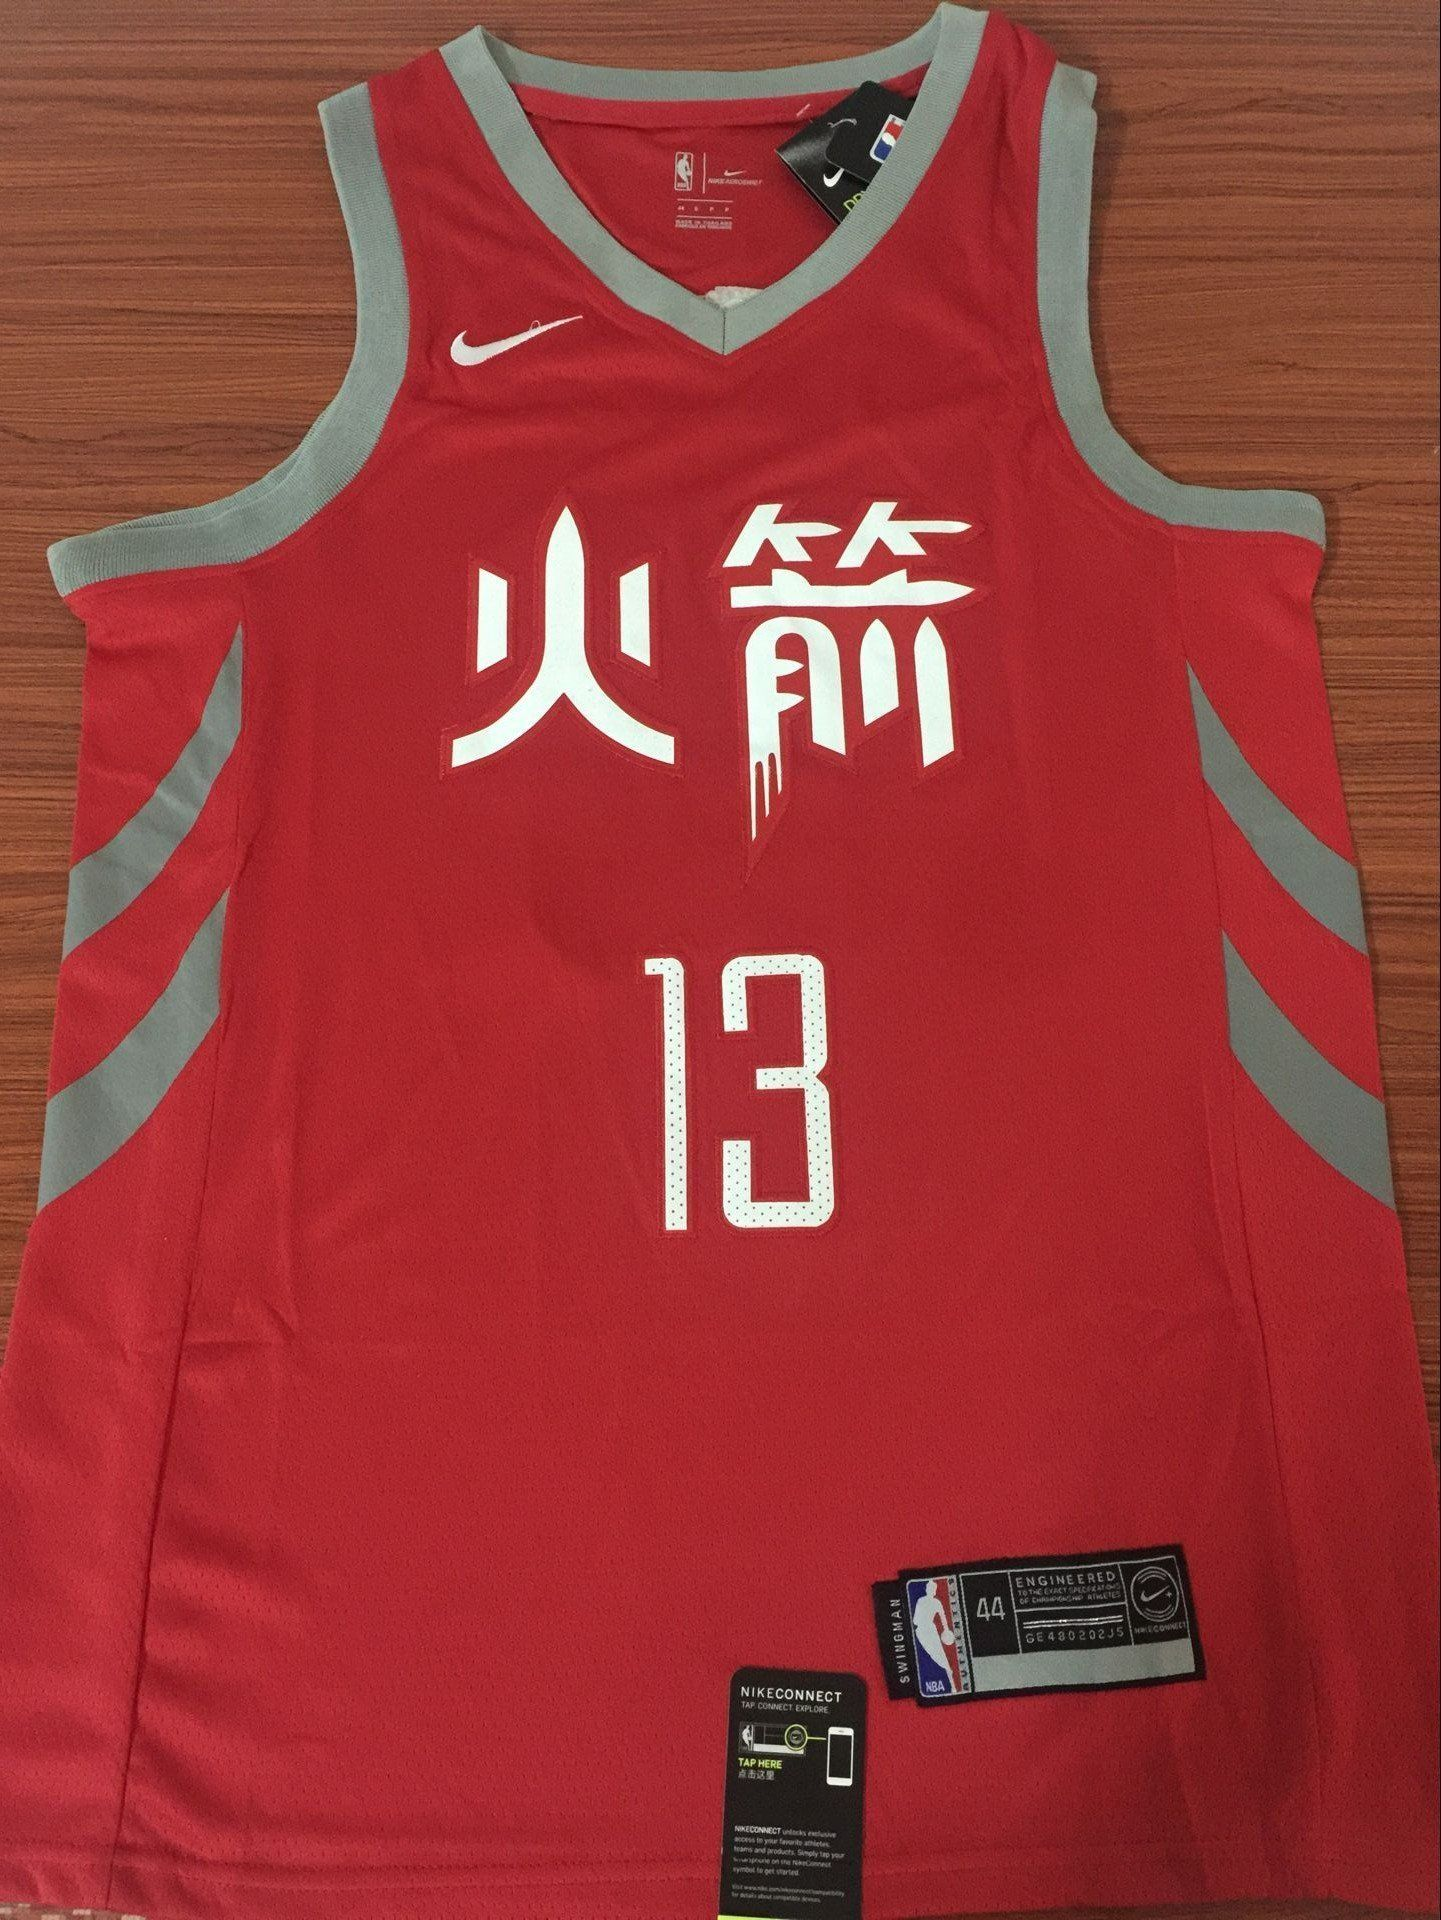 593f8dac9 Men 13 James Harden Jersey Red color Houston Rockets Swingman Fanatics size  S M L XL XXL XXXL